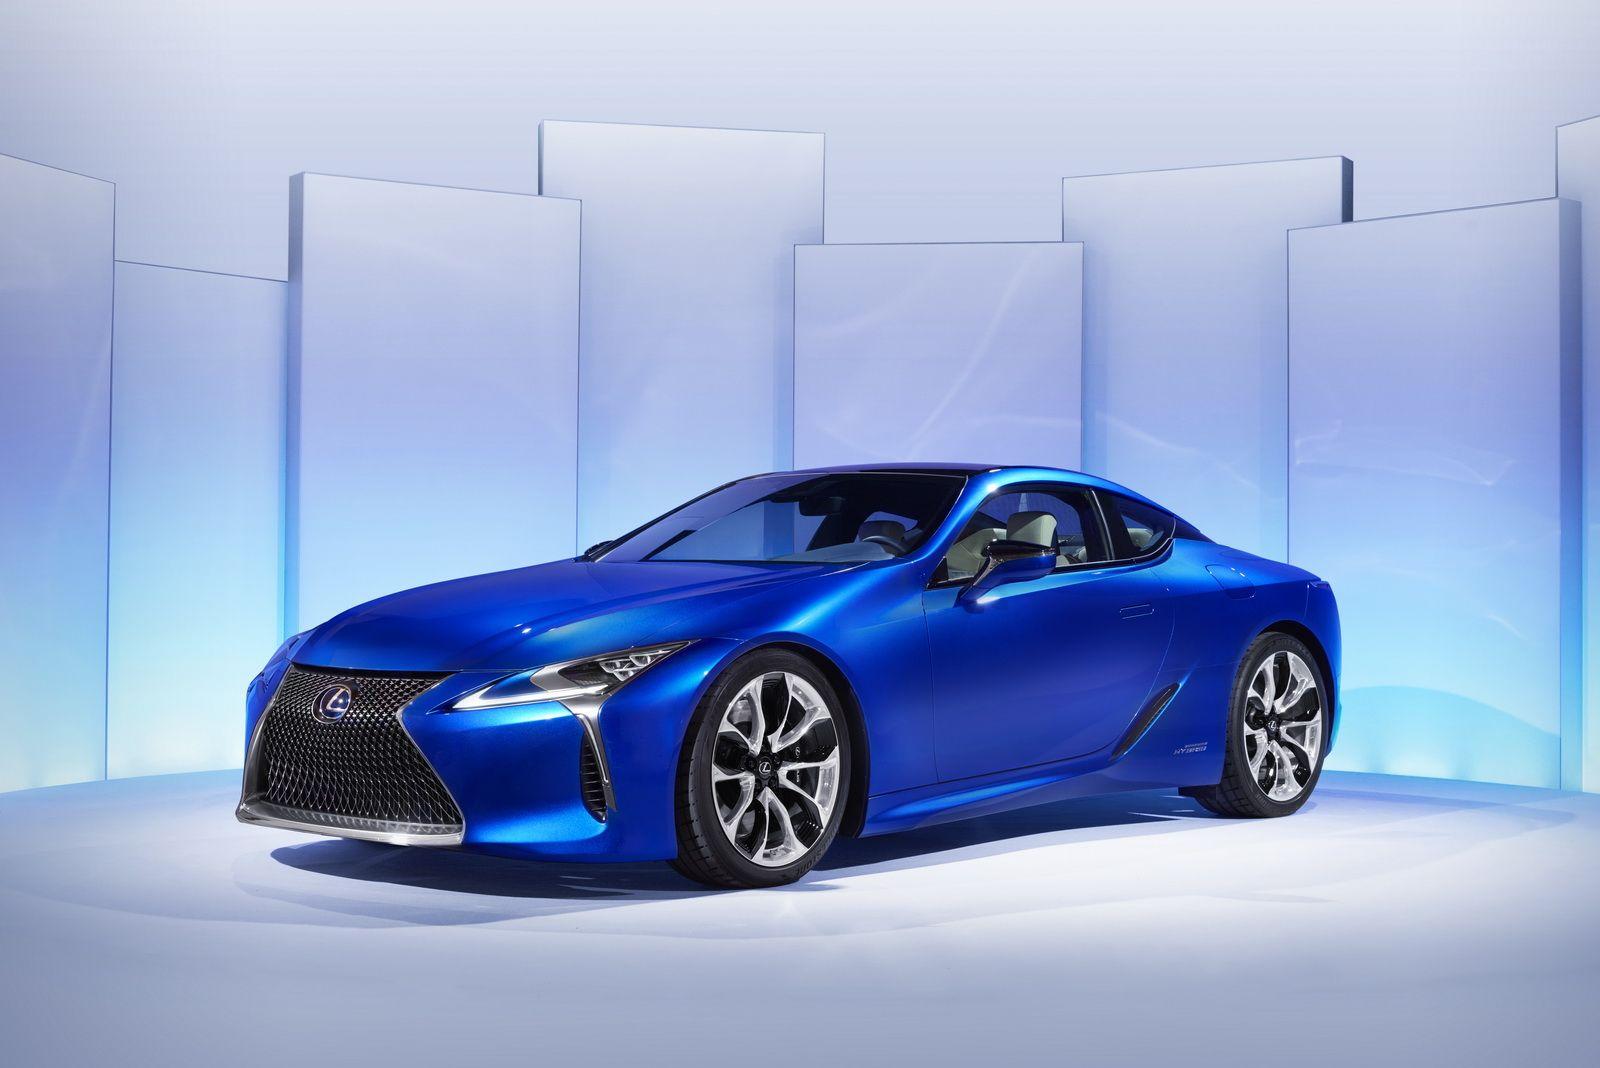 2018 lexus lc 500 blue. the manufacturer of 2018 lexus lc 500 h, got its inspiration from daimler chrysler. lc blue m